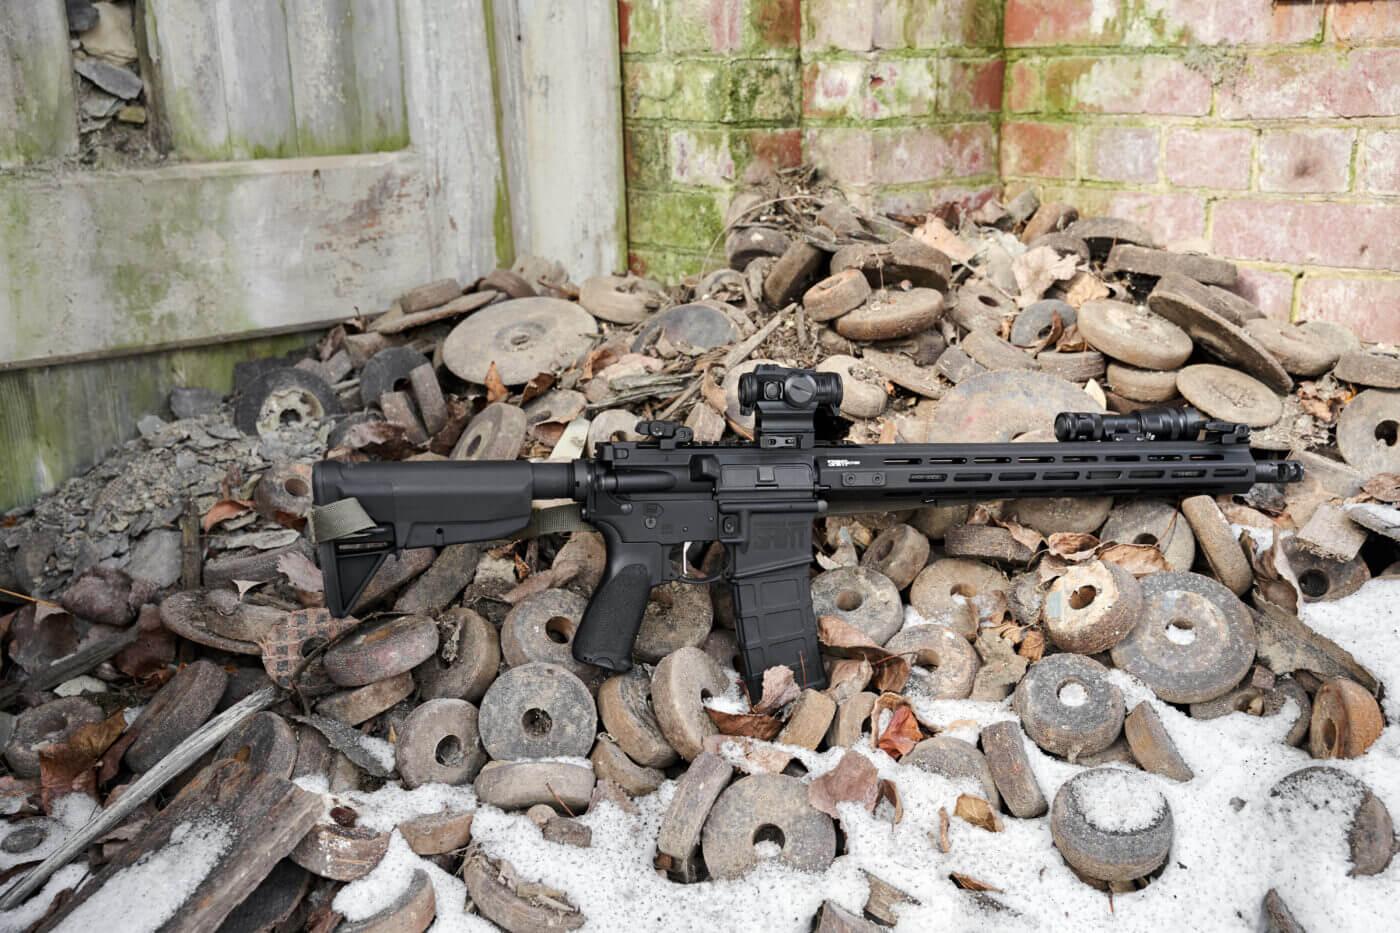 Springfield Armory SAINT rifle testing